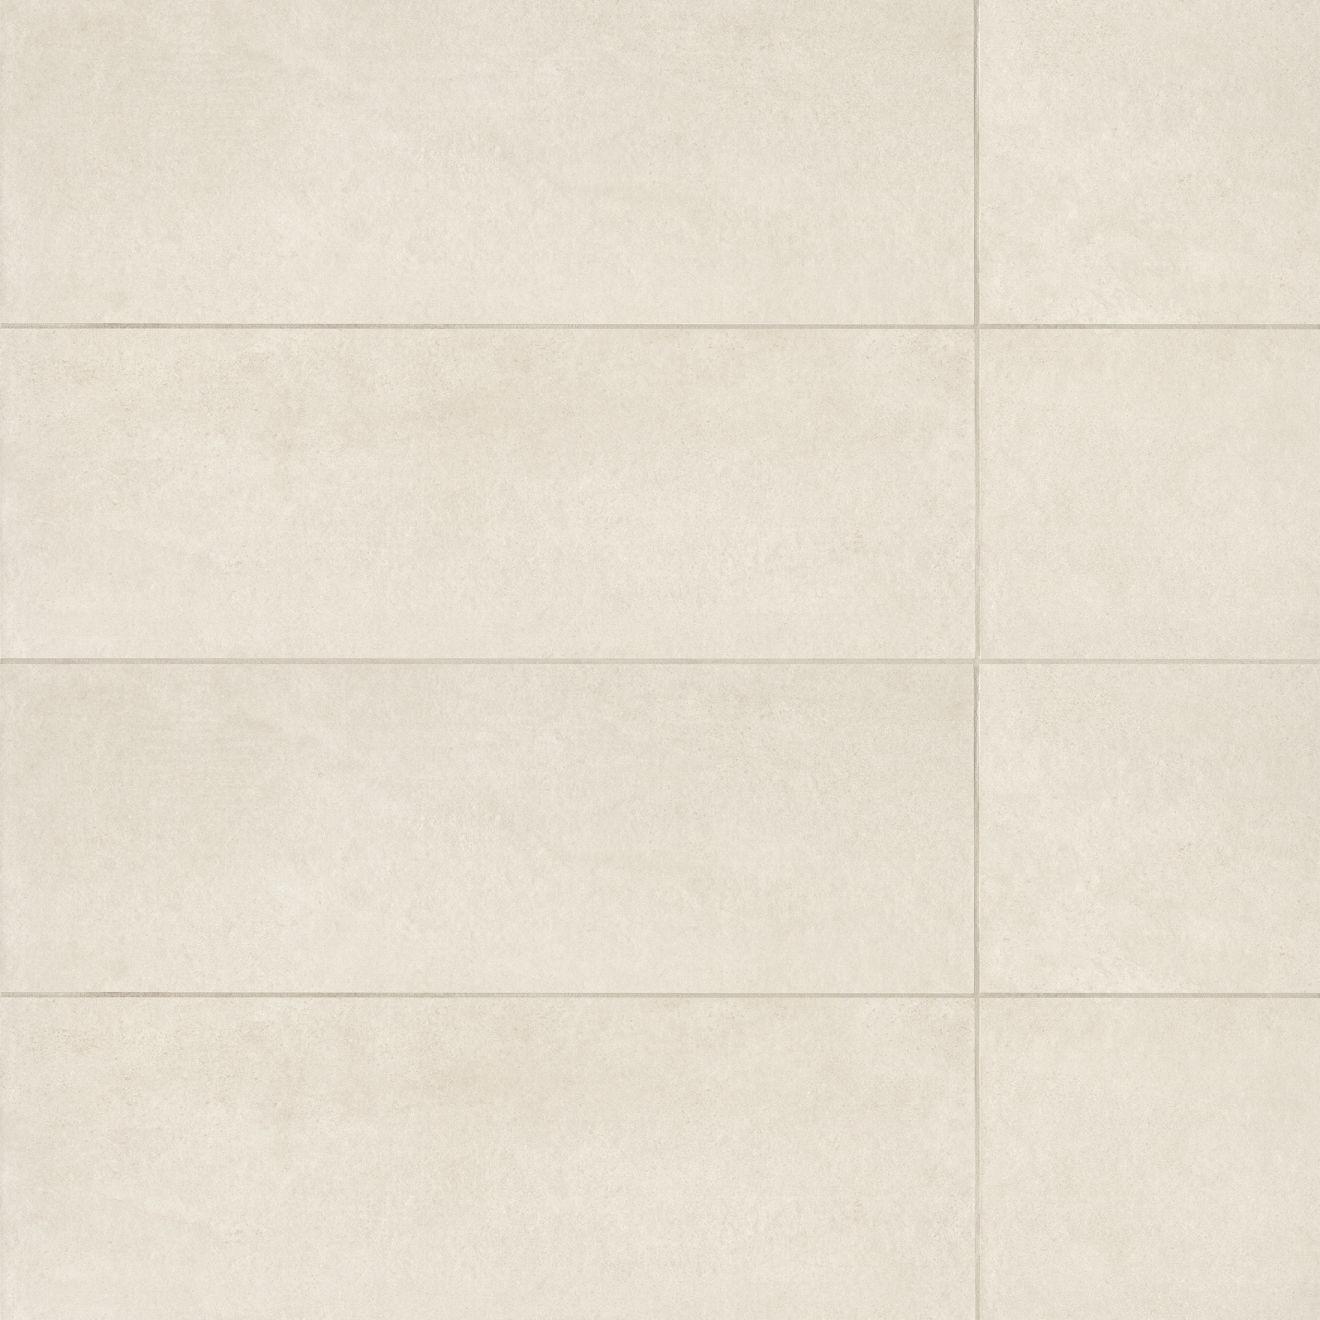 "Calix 12"" x 36"" Matte Ceramic Wall Tile in Beige"